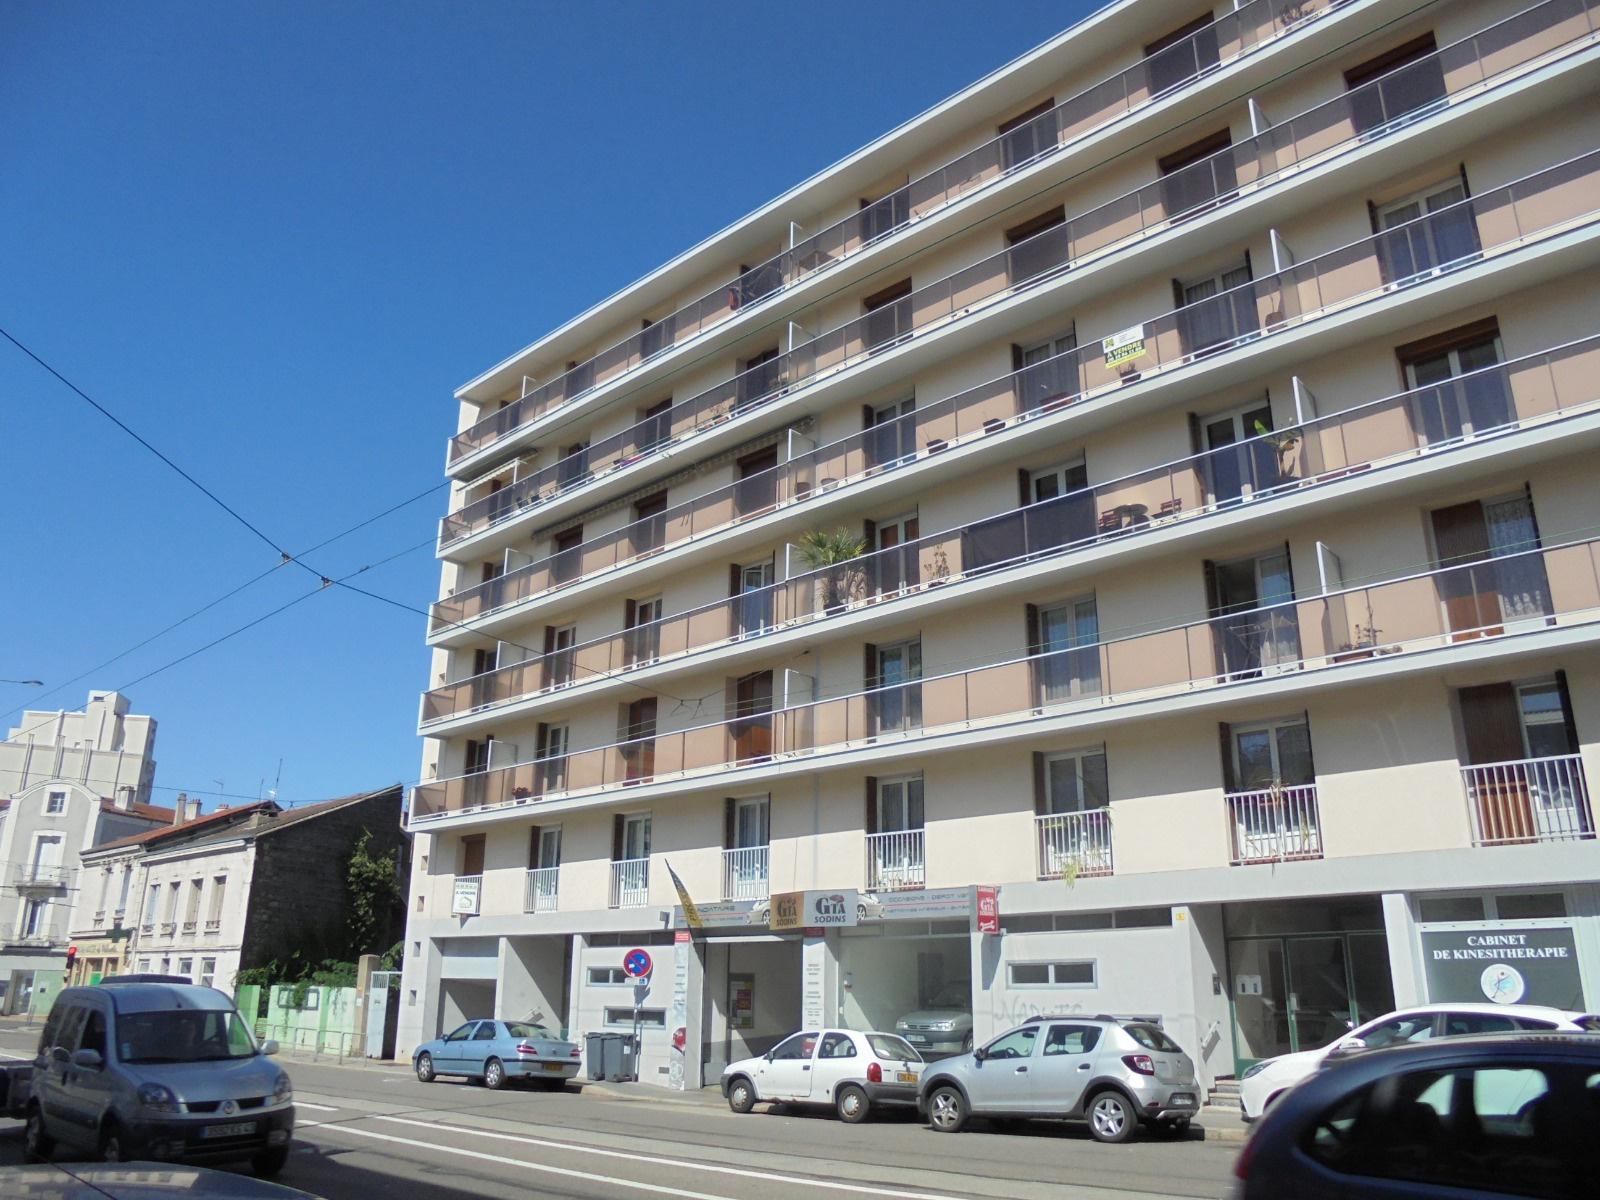 Location f2 3 avenue de rochetaill e for Garage tardy saint etienne